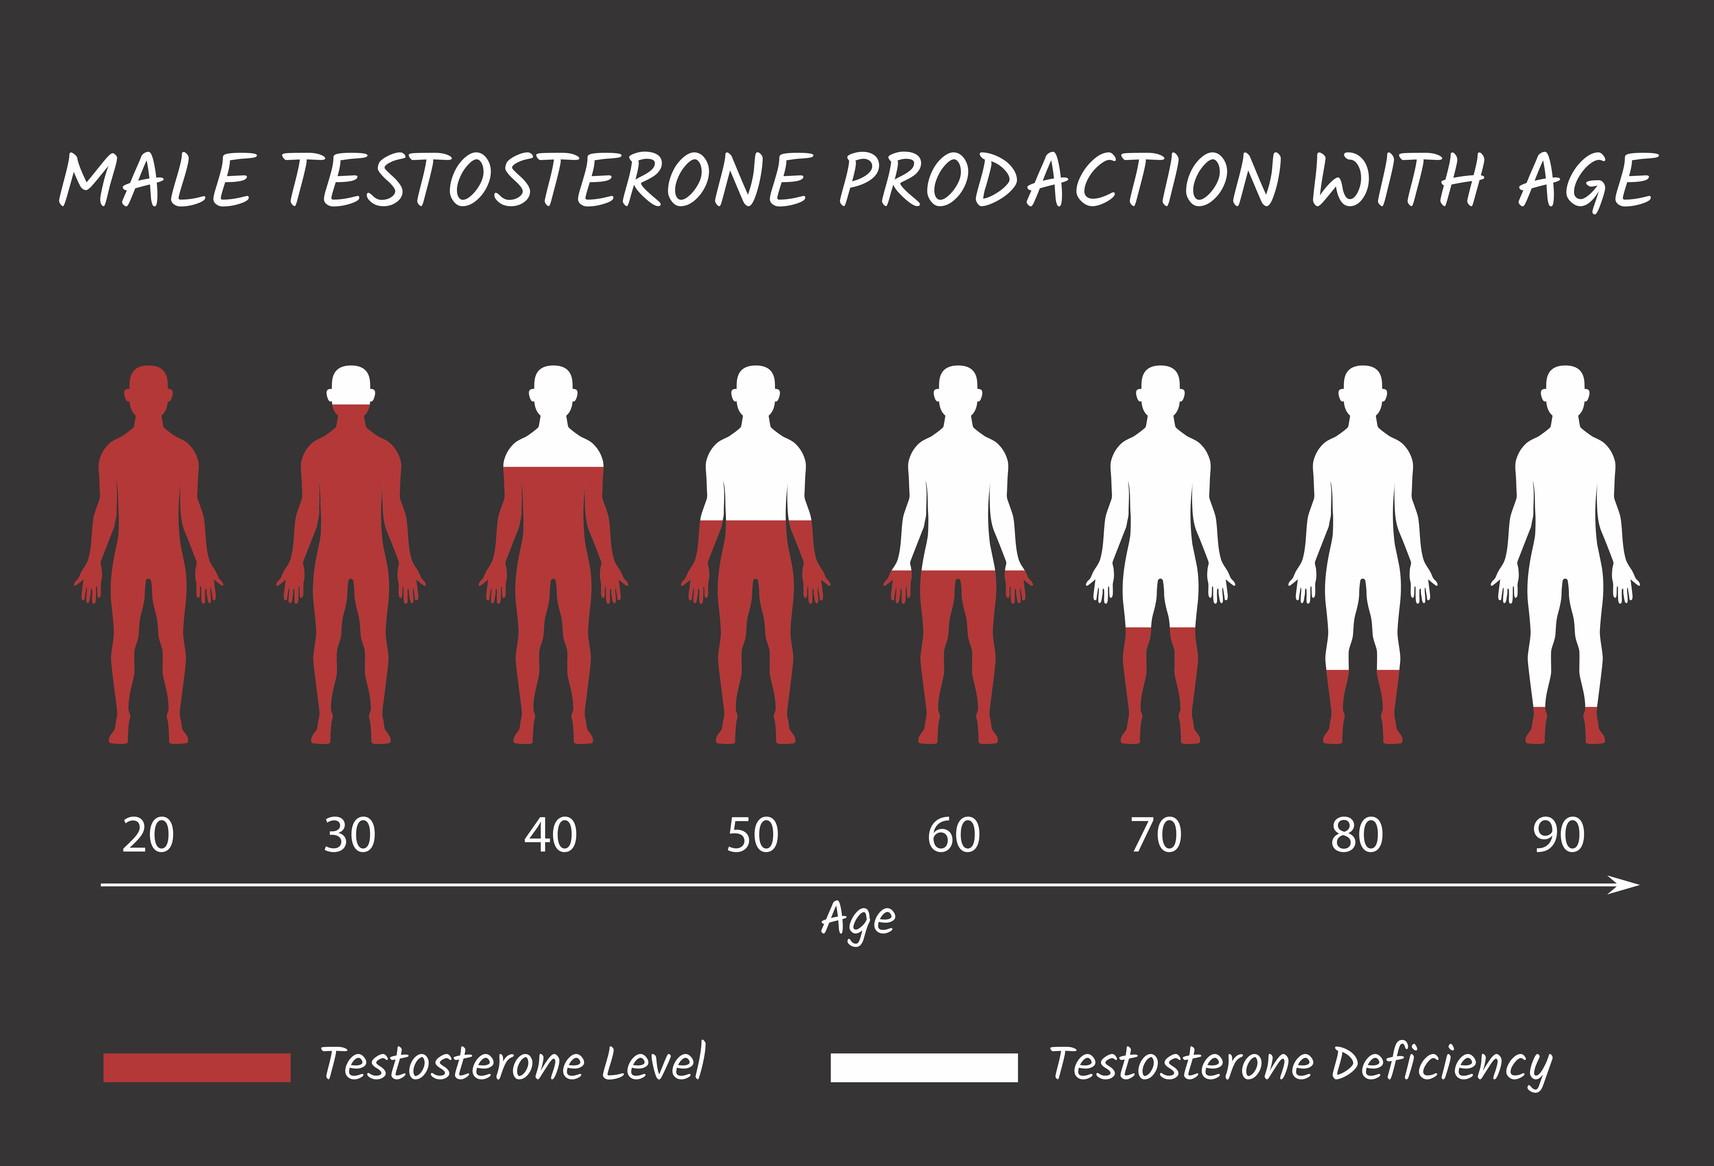 lave testosteronnivå symptomer